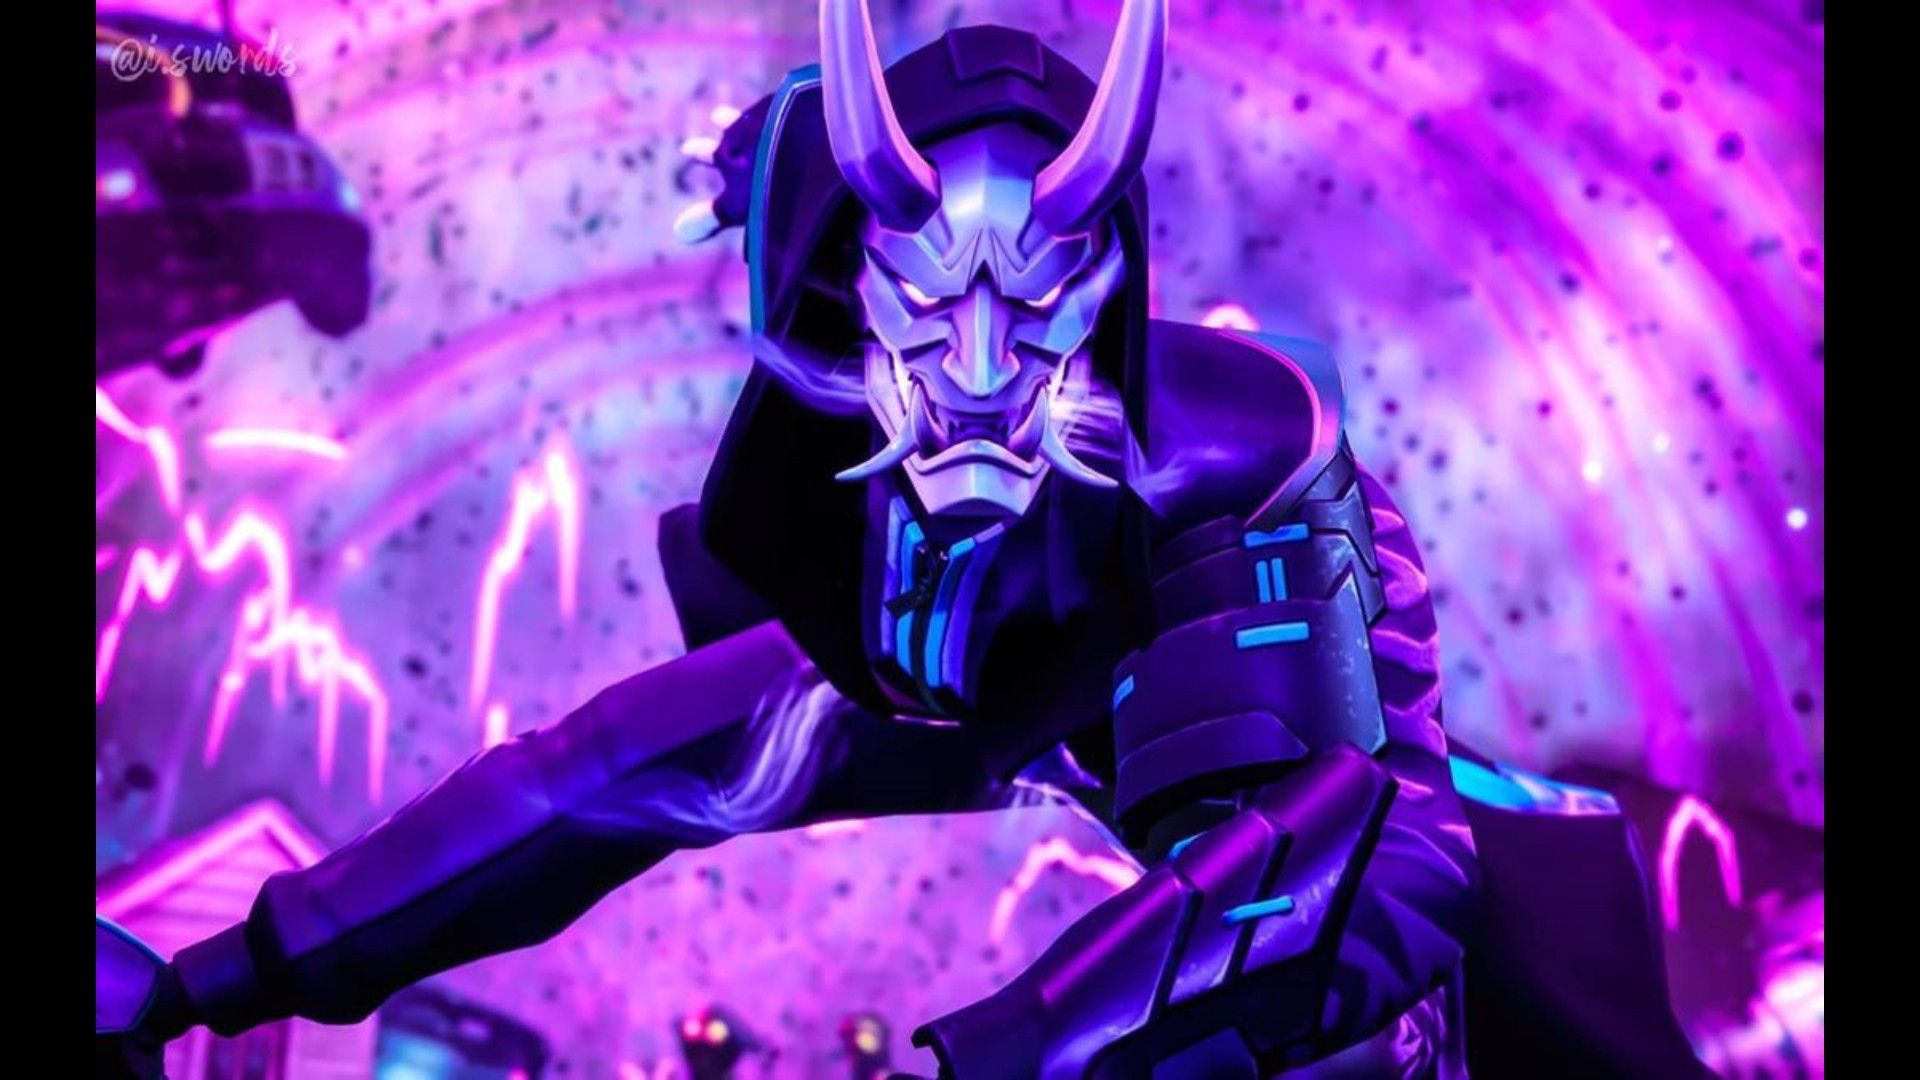 Fortnite Fade In 2020 Futuristic Art Gaming Wallpapers Faded